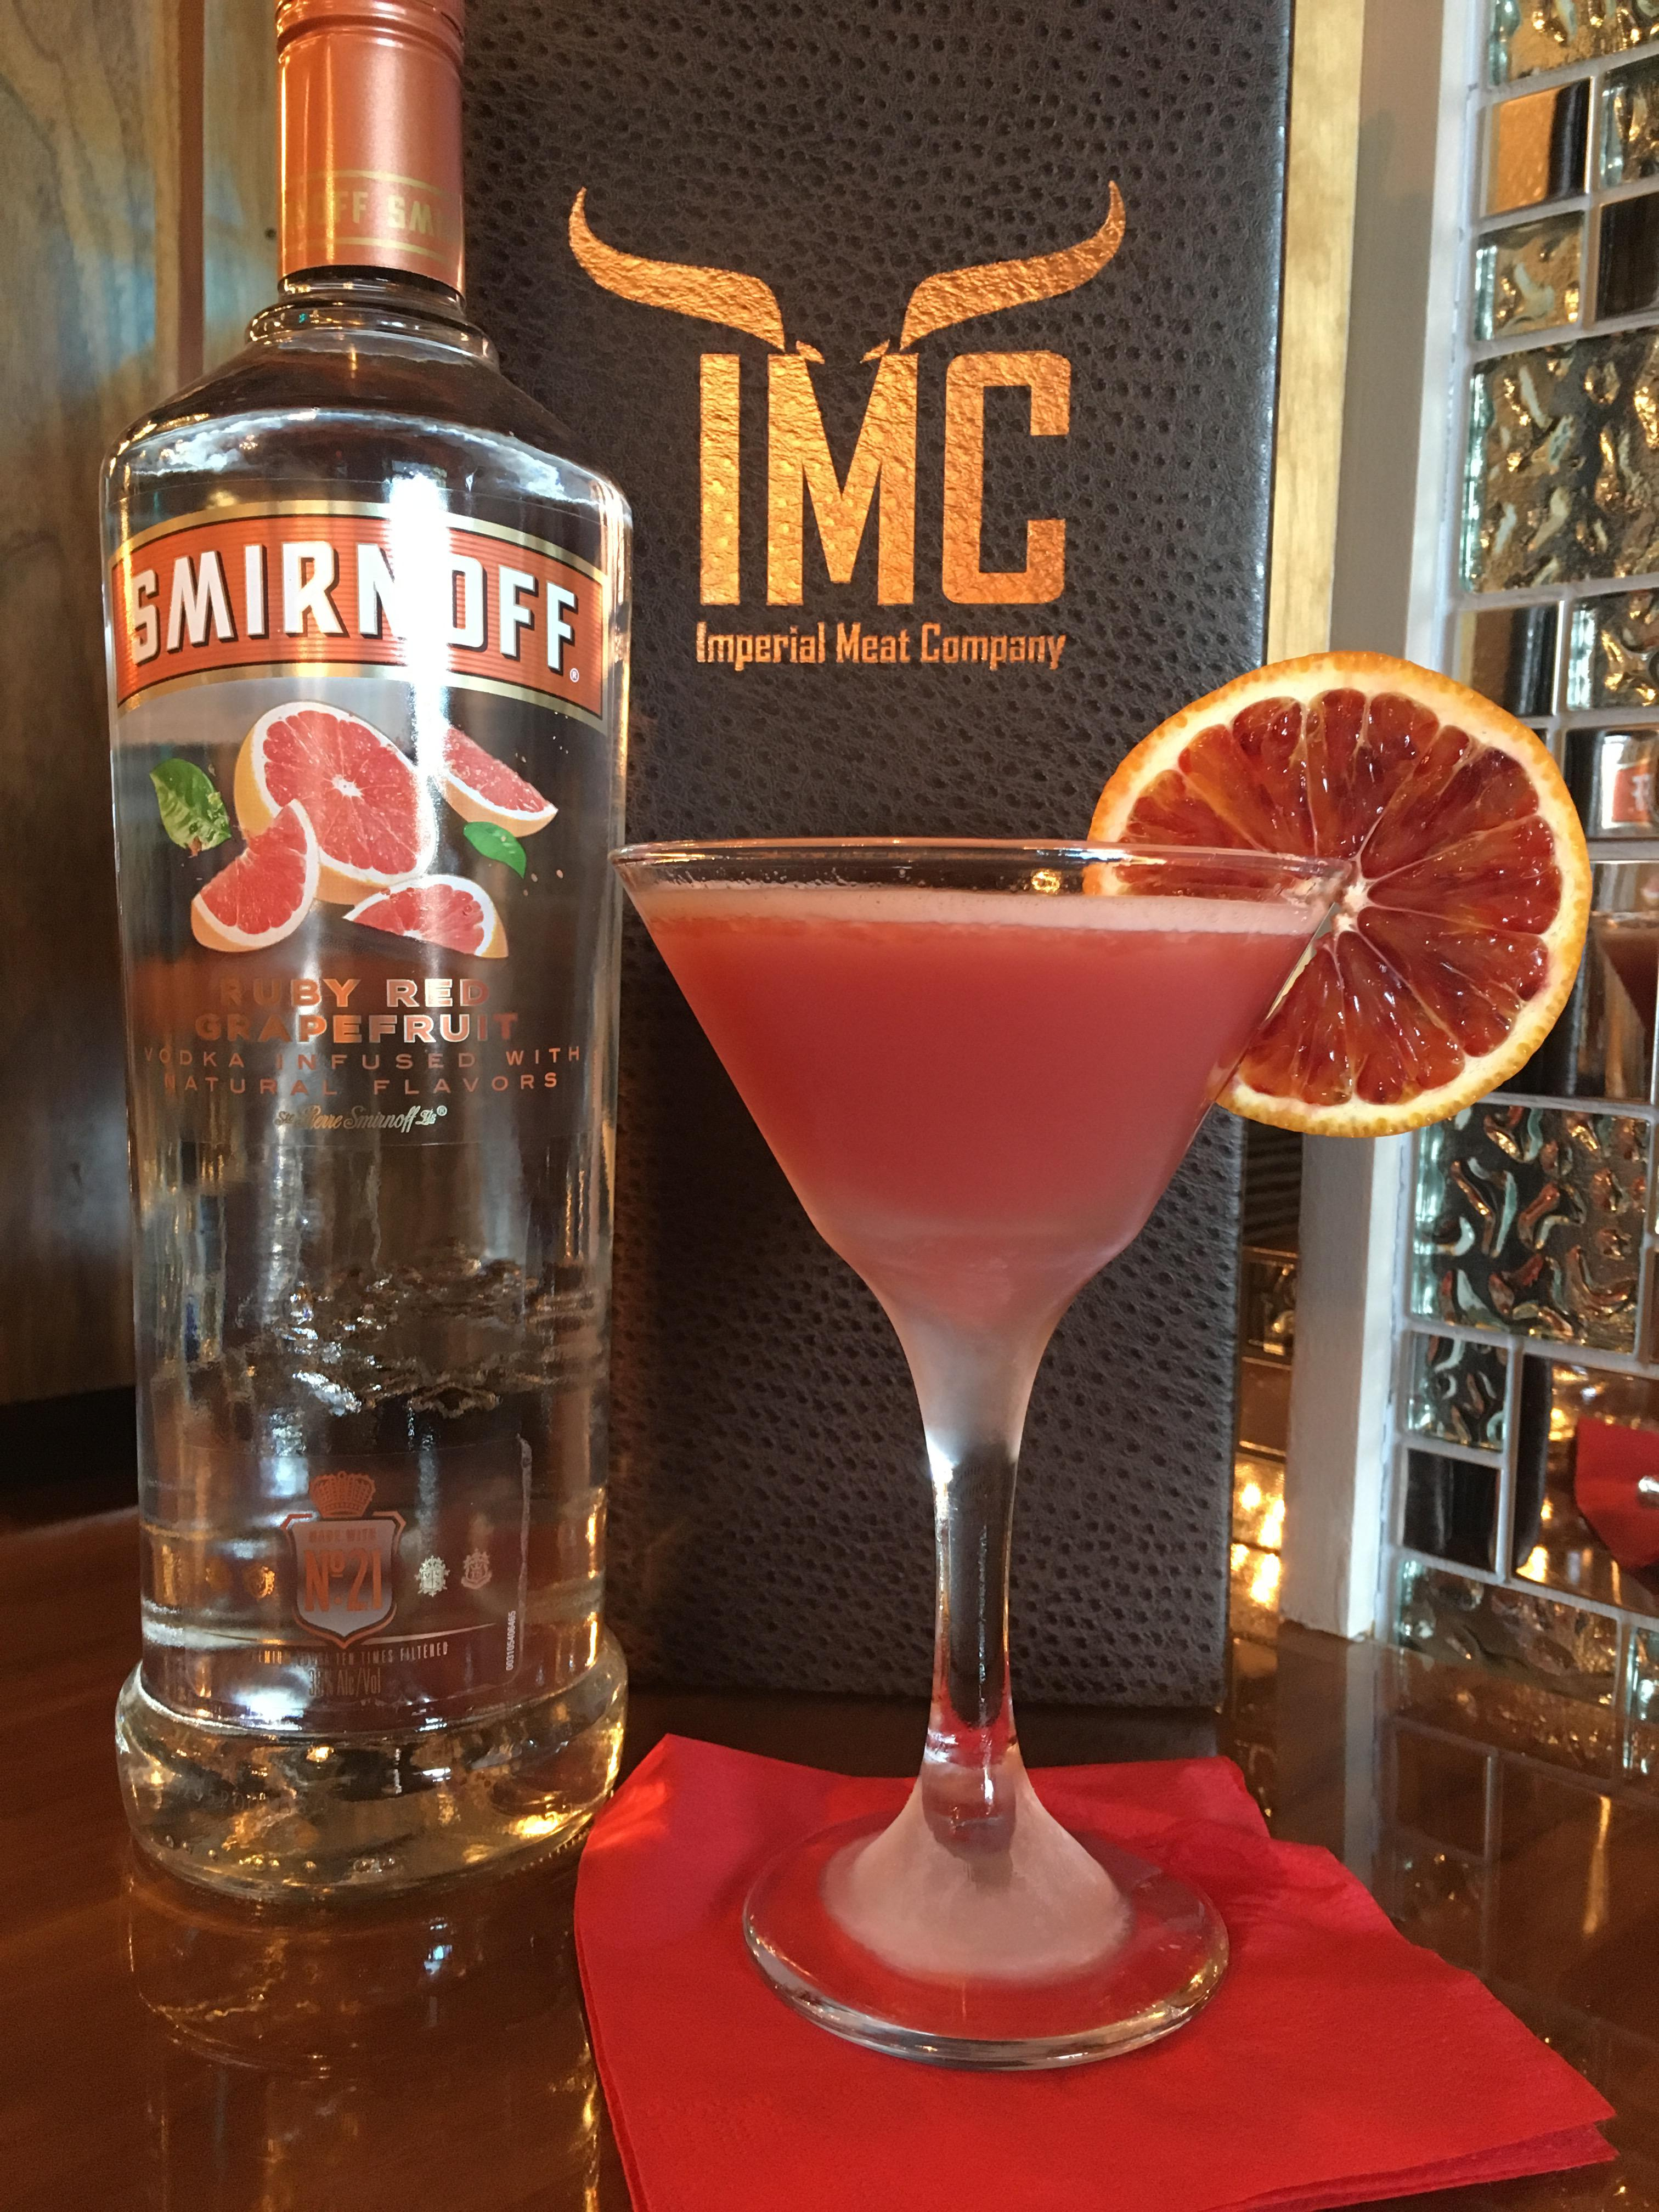 IMC Restaurant & Bar image 30